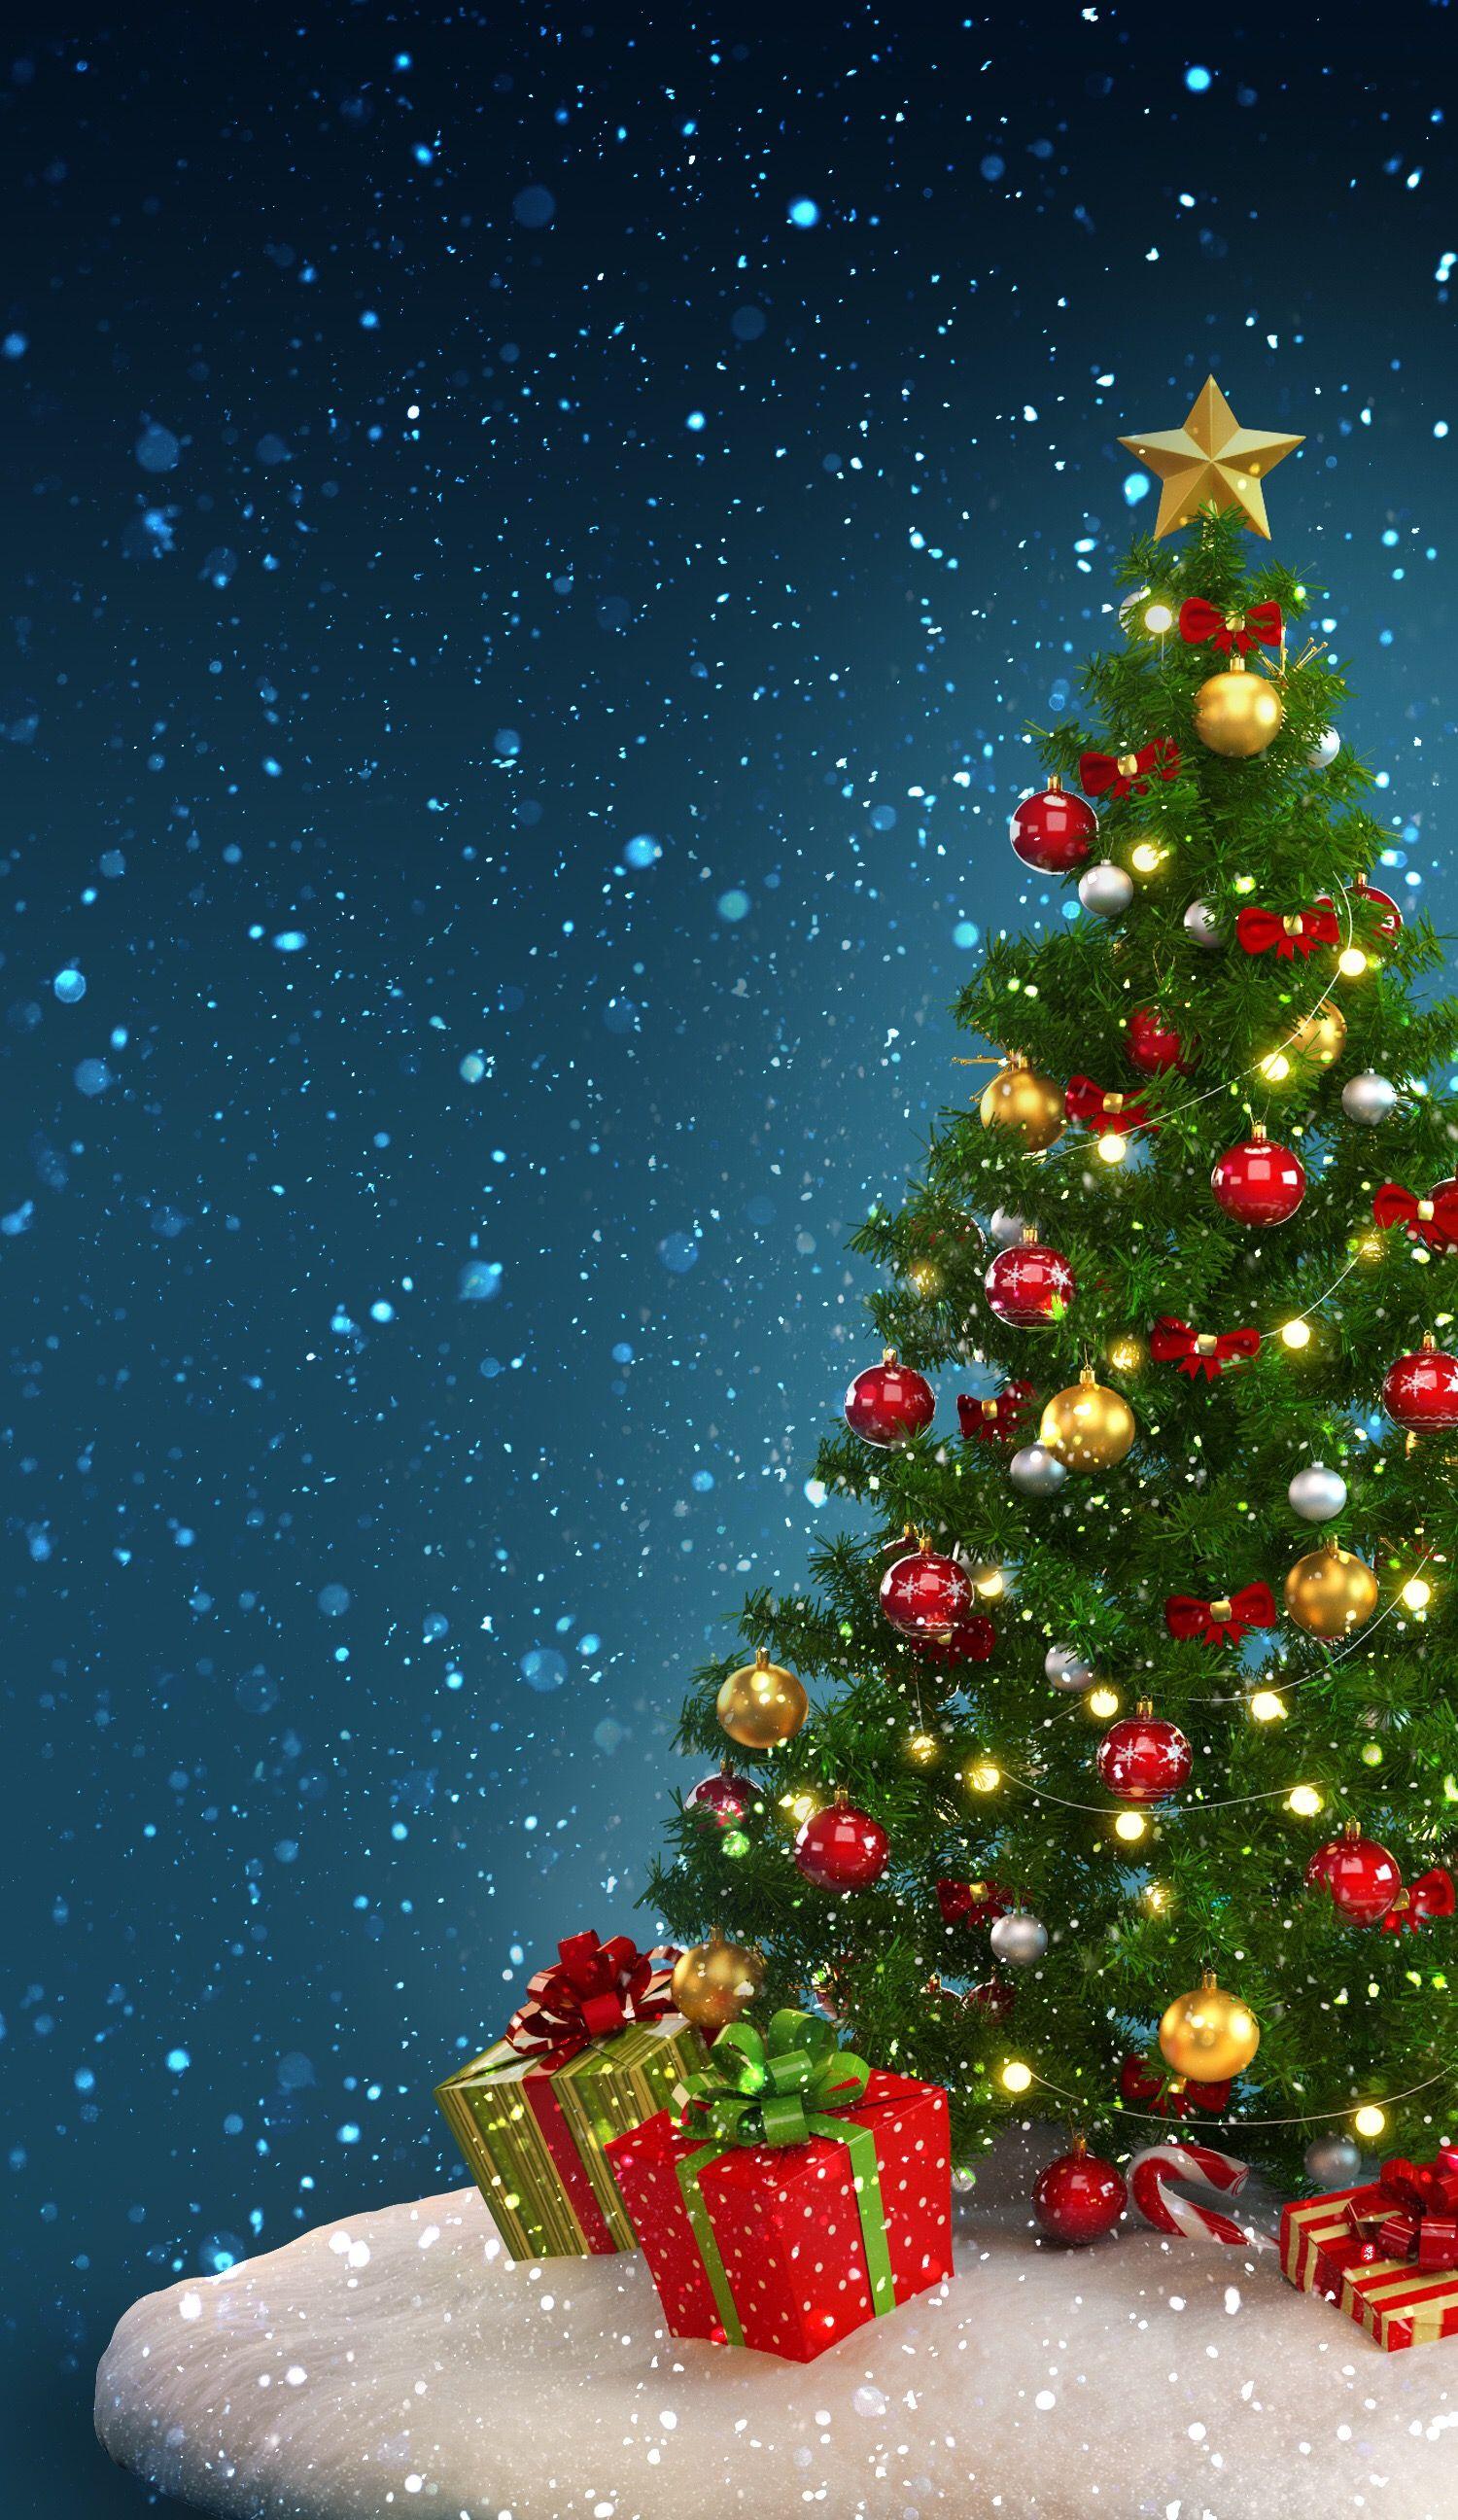 Christmas lights background tumblr christmas tree blur tablet phone - Christmas Tree Wallpaper